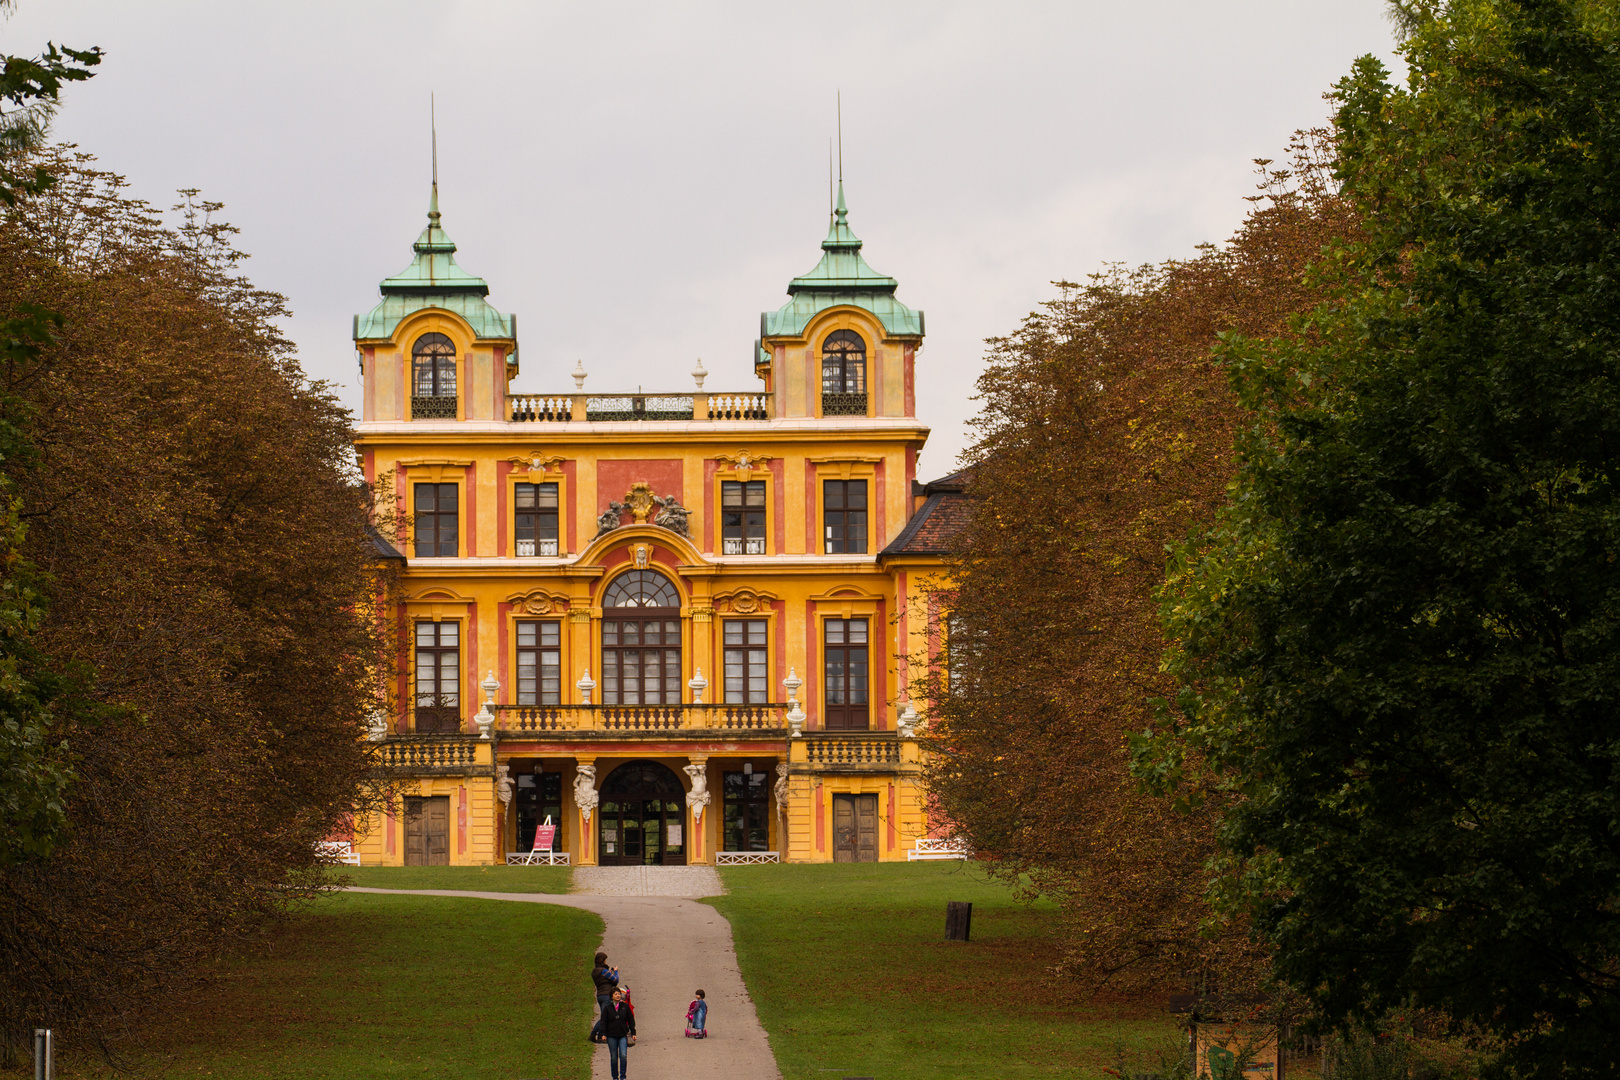 Schloss Favorite Ludwigsburg